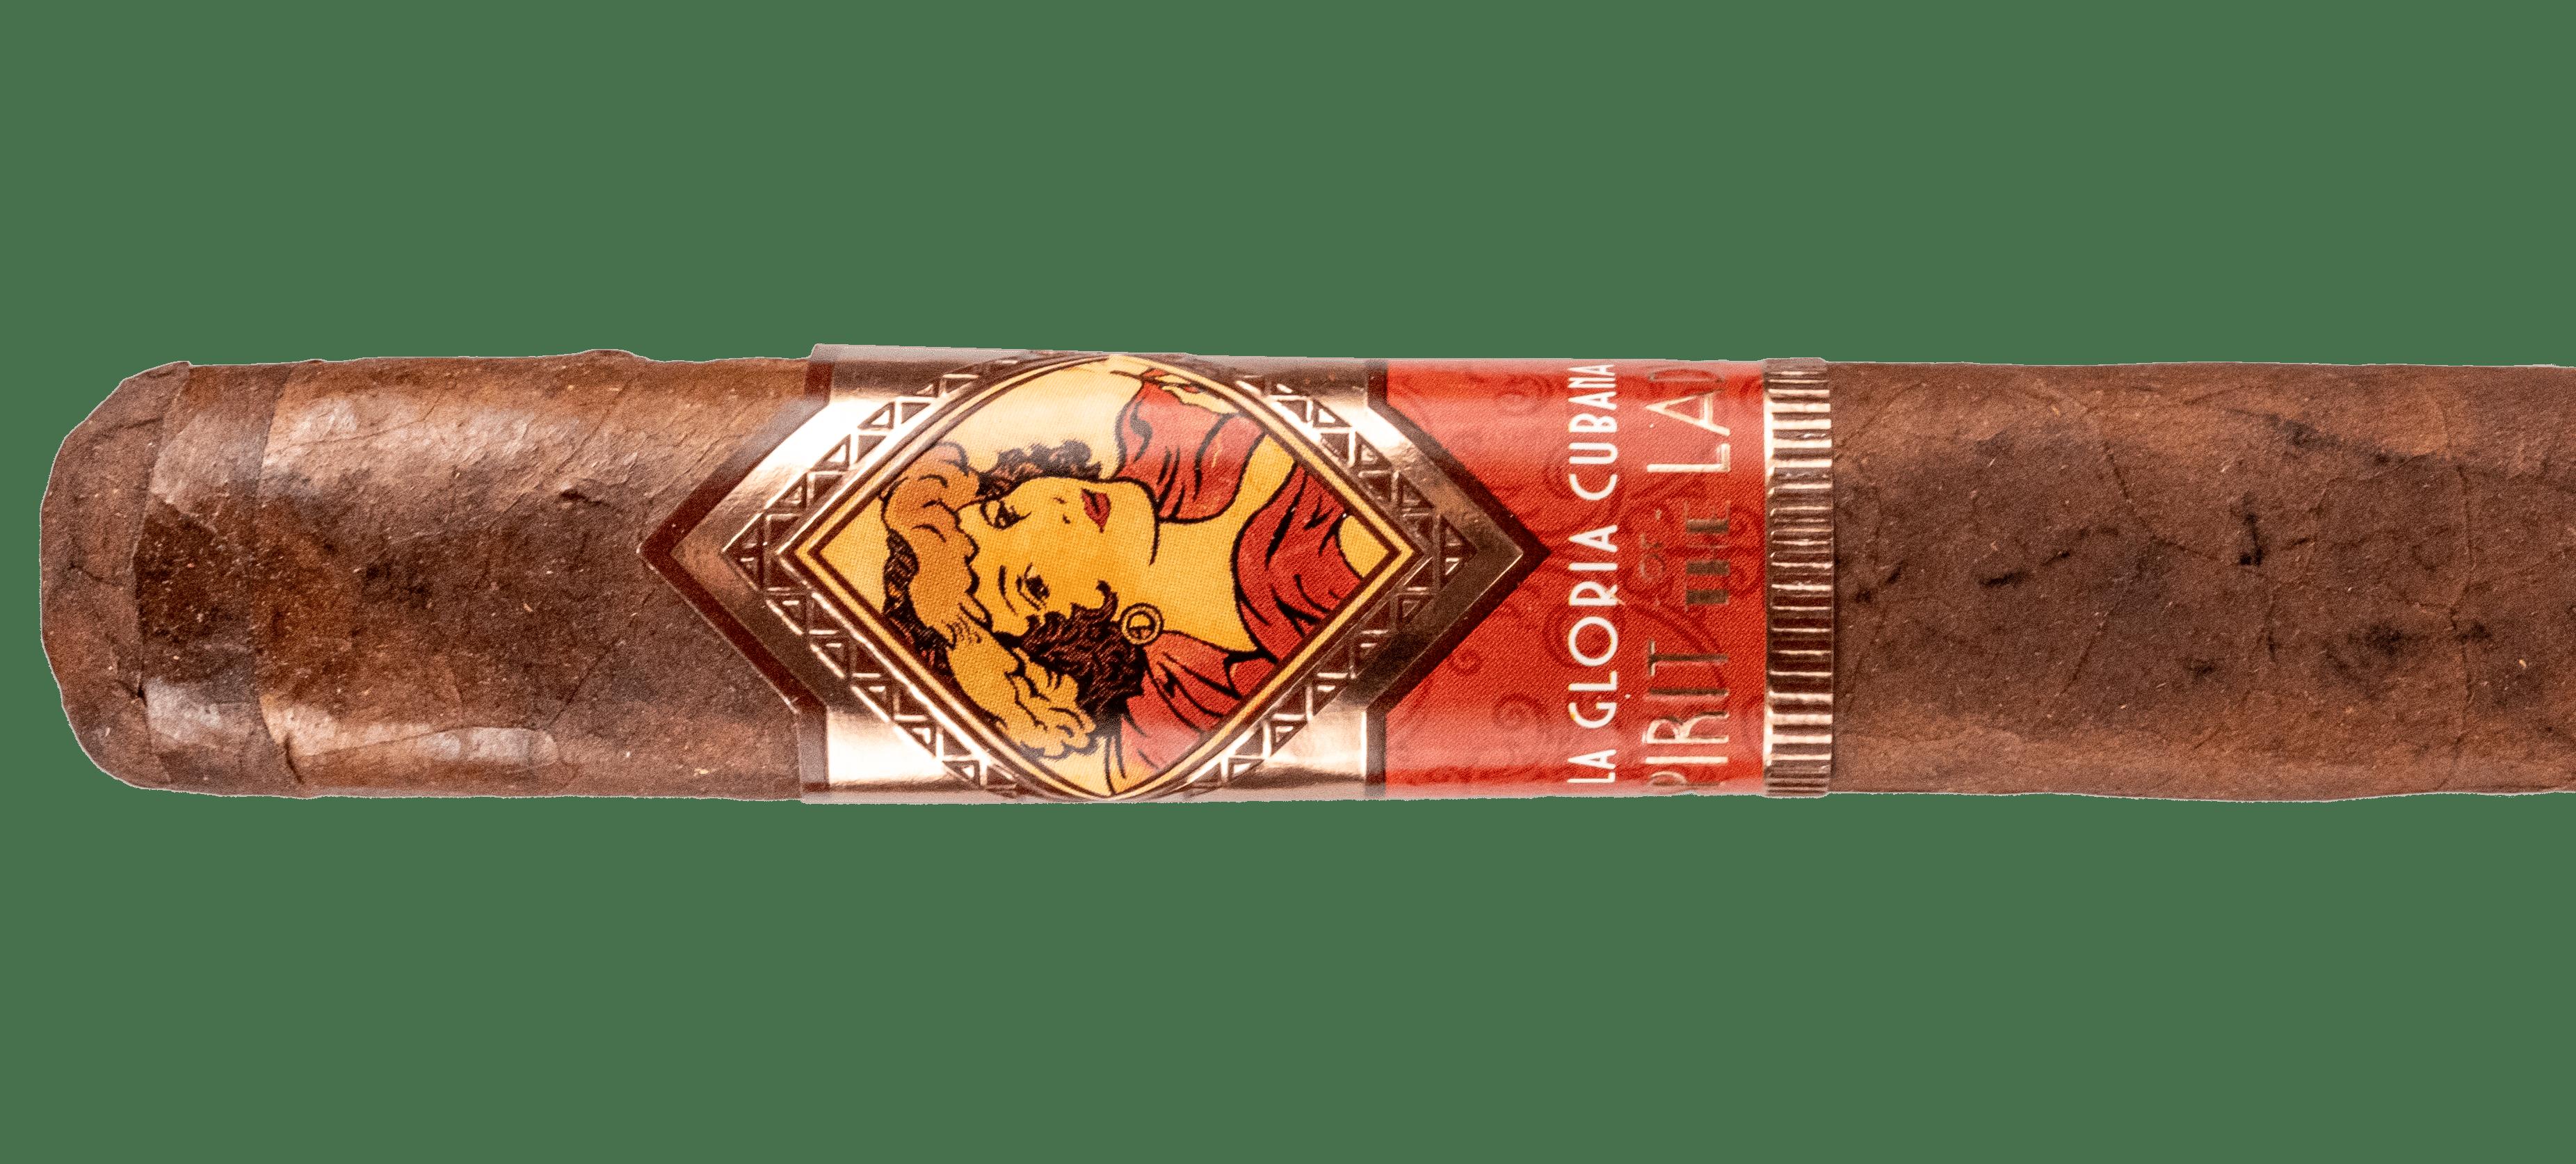 La Gloria Cubana Spirit of the Lady Toro - Blind Cigar Review